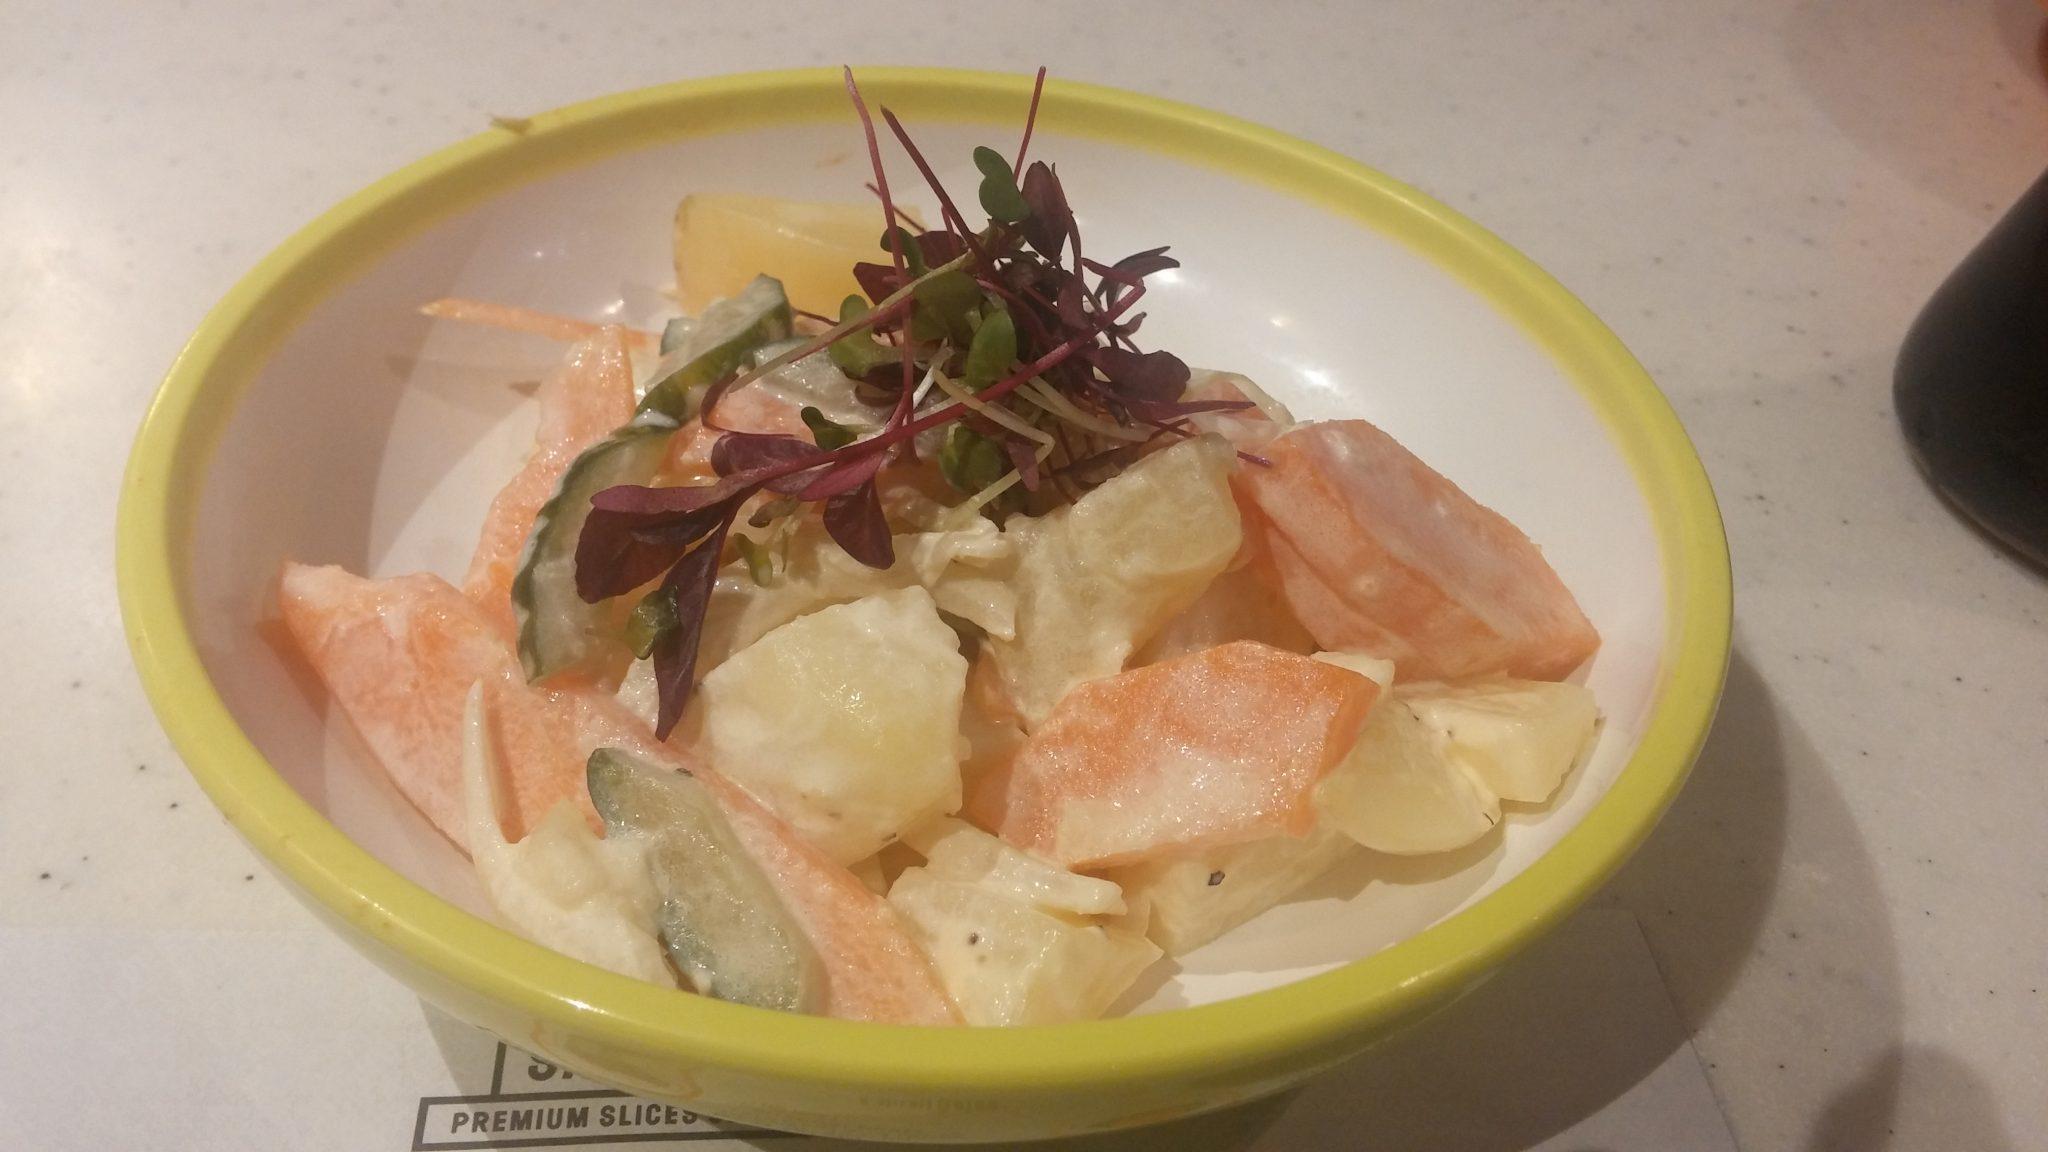 potato, quick pickled vegetables, karashi mustard mayonnaise dressing